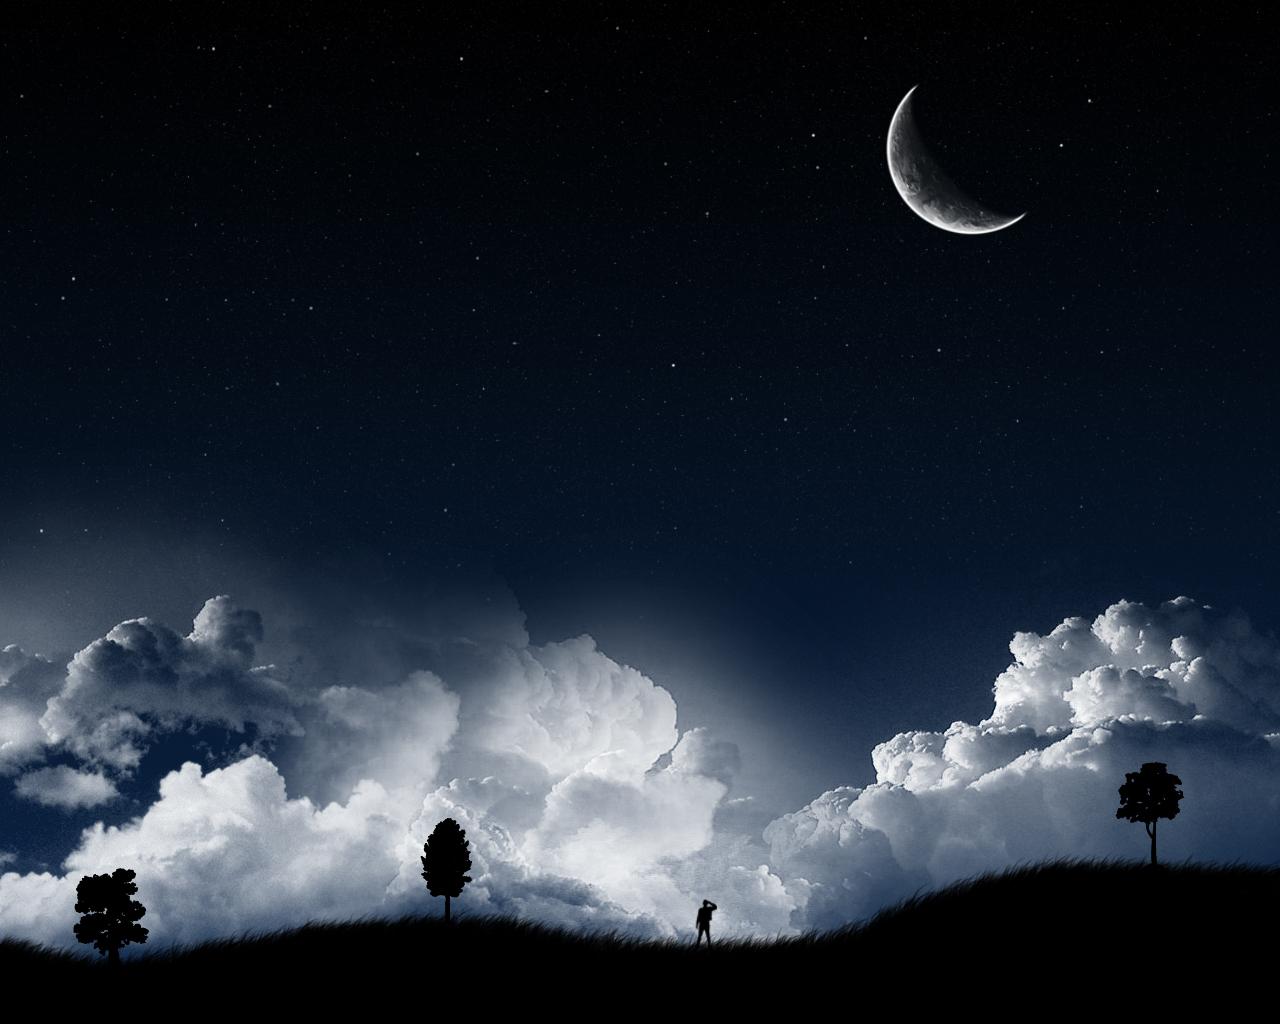 Dark Starry Night Vector Wallpaper 1280x1024